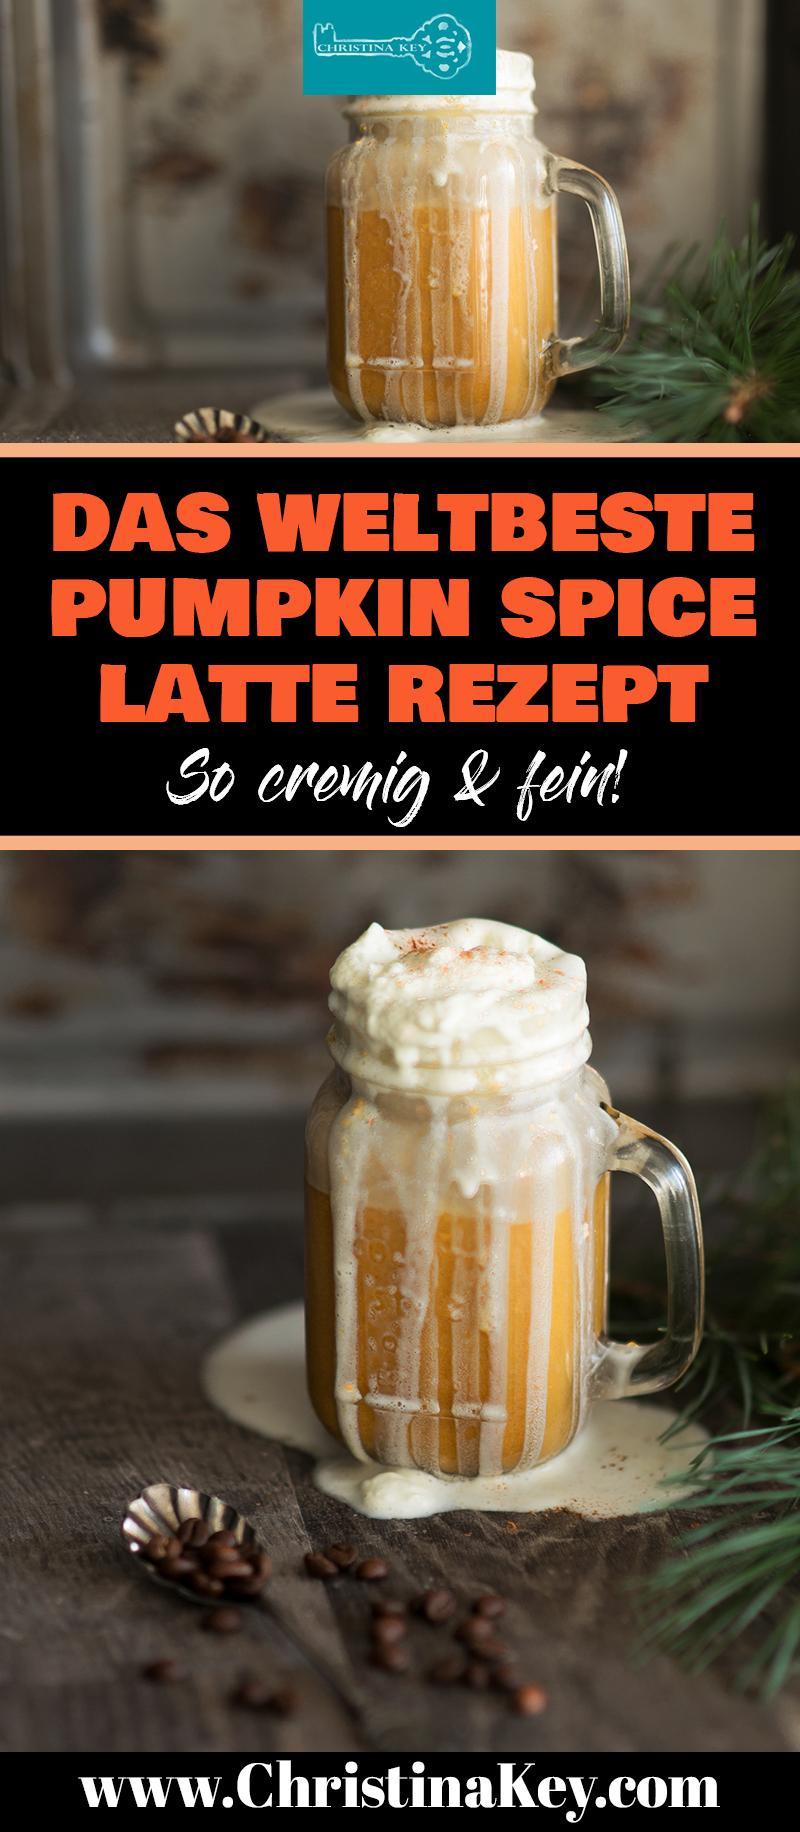 Kürbis Rezepte Pumpkin Spice Latte